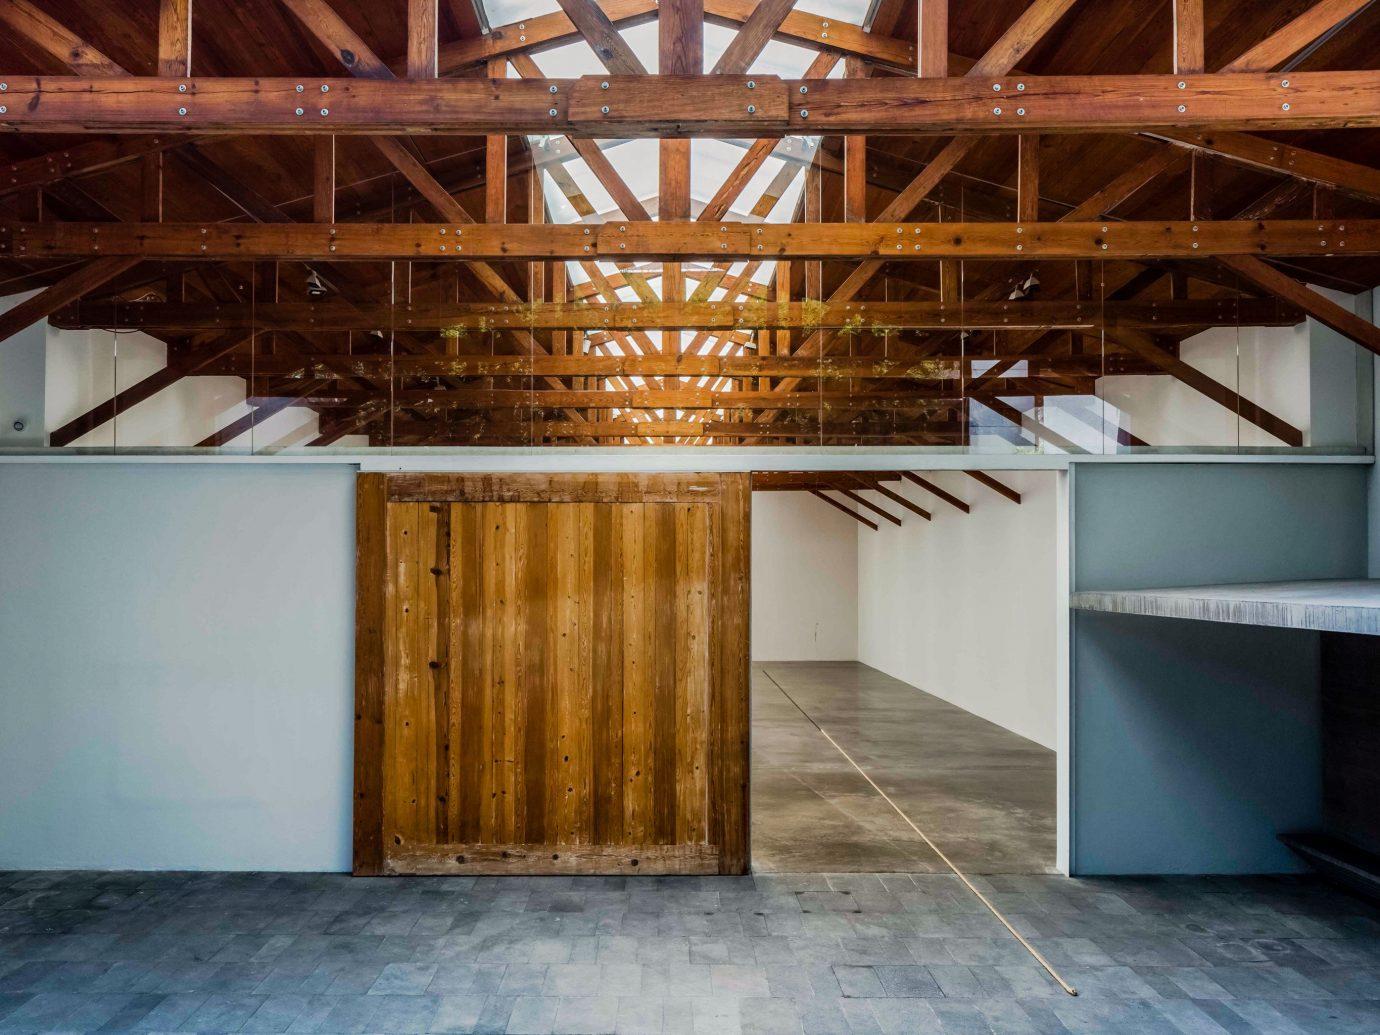 City Mexico City Trip Ideas building indoor ceiling floor Architecture beam wooden wood daylighting interior design hardwood flooring lumber